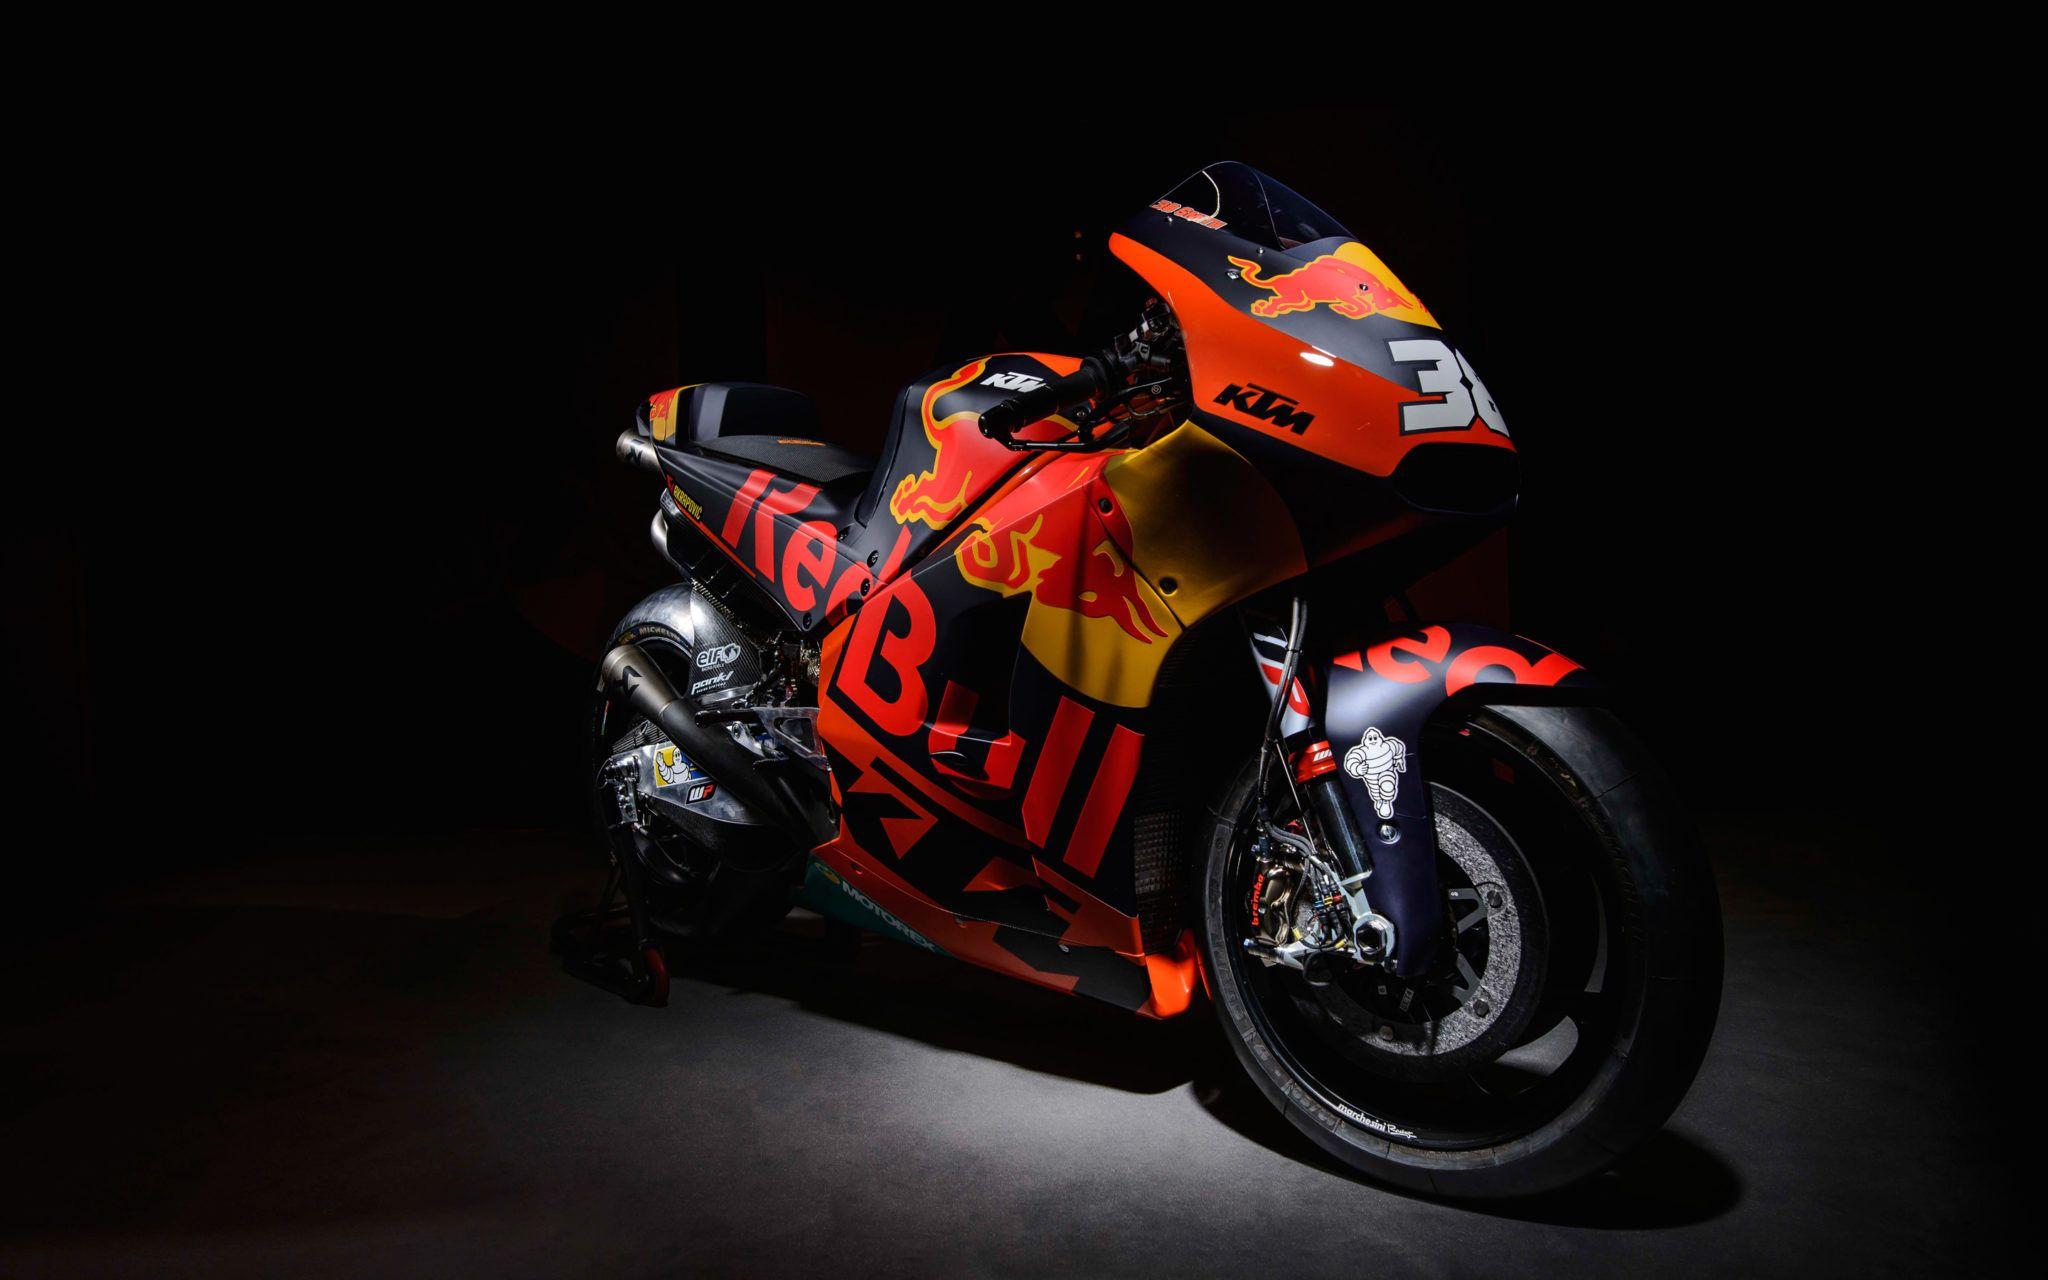 1080p Ducati Streetfighter V4 Wallpaper